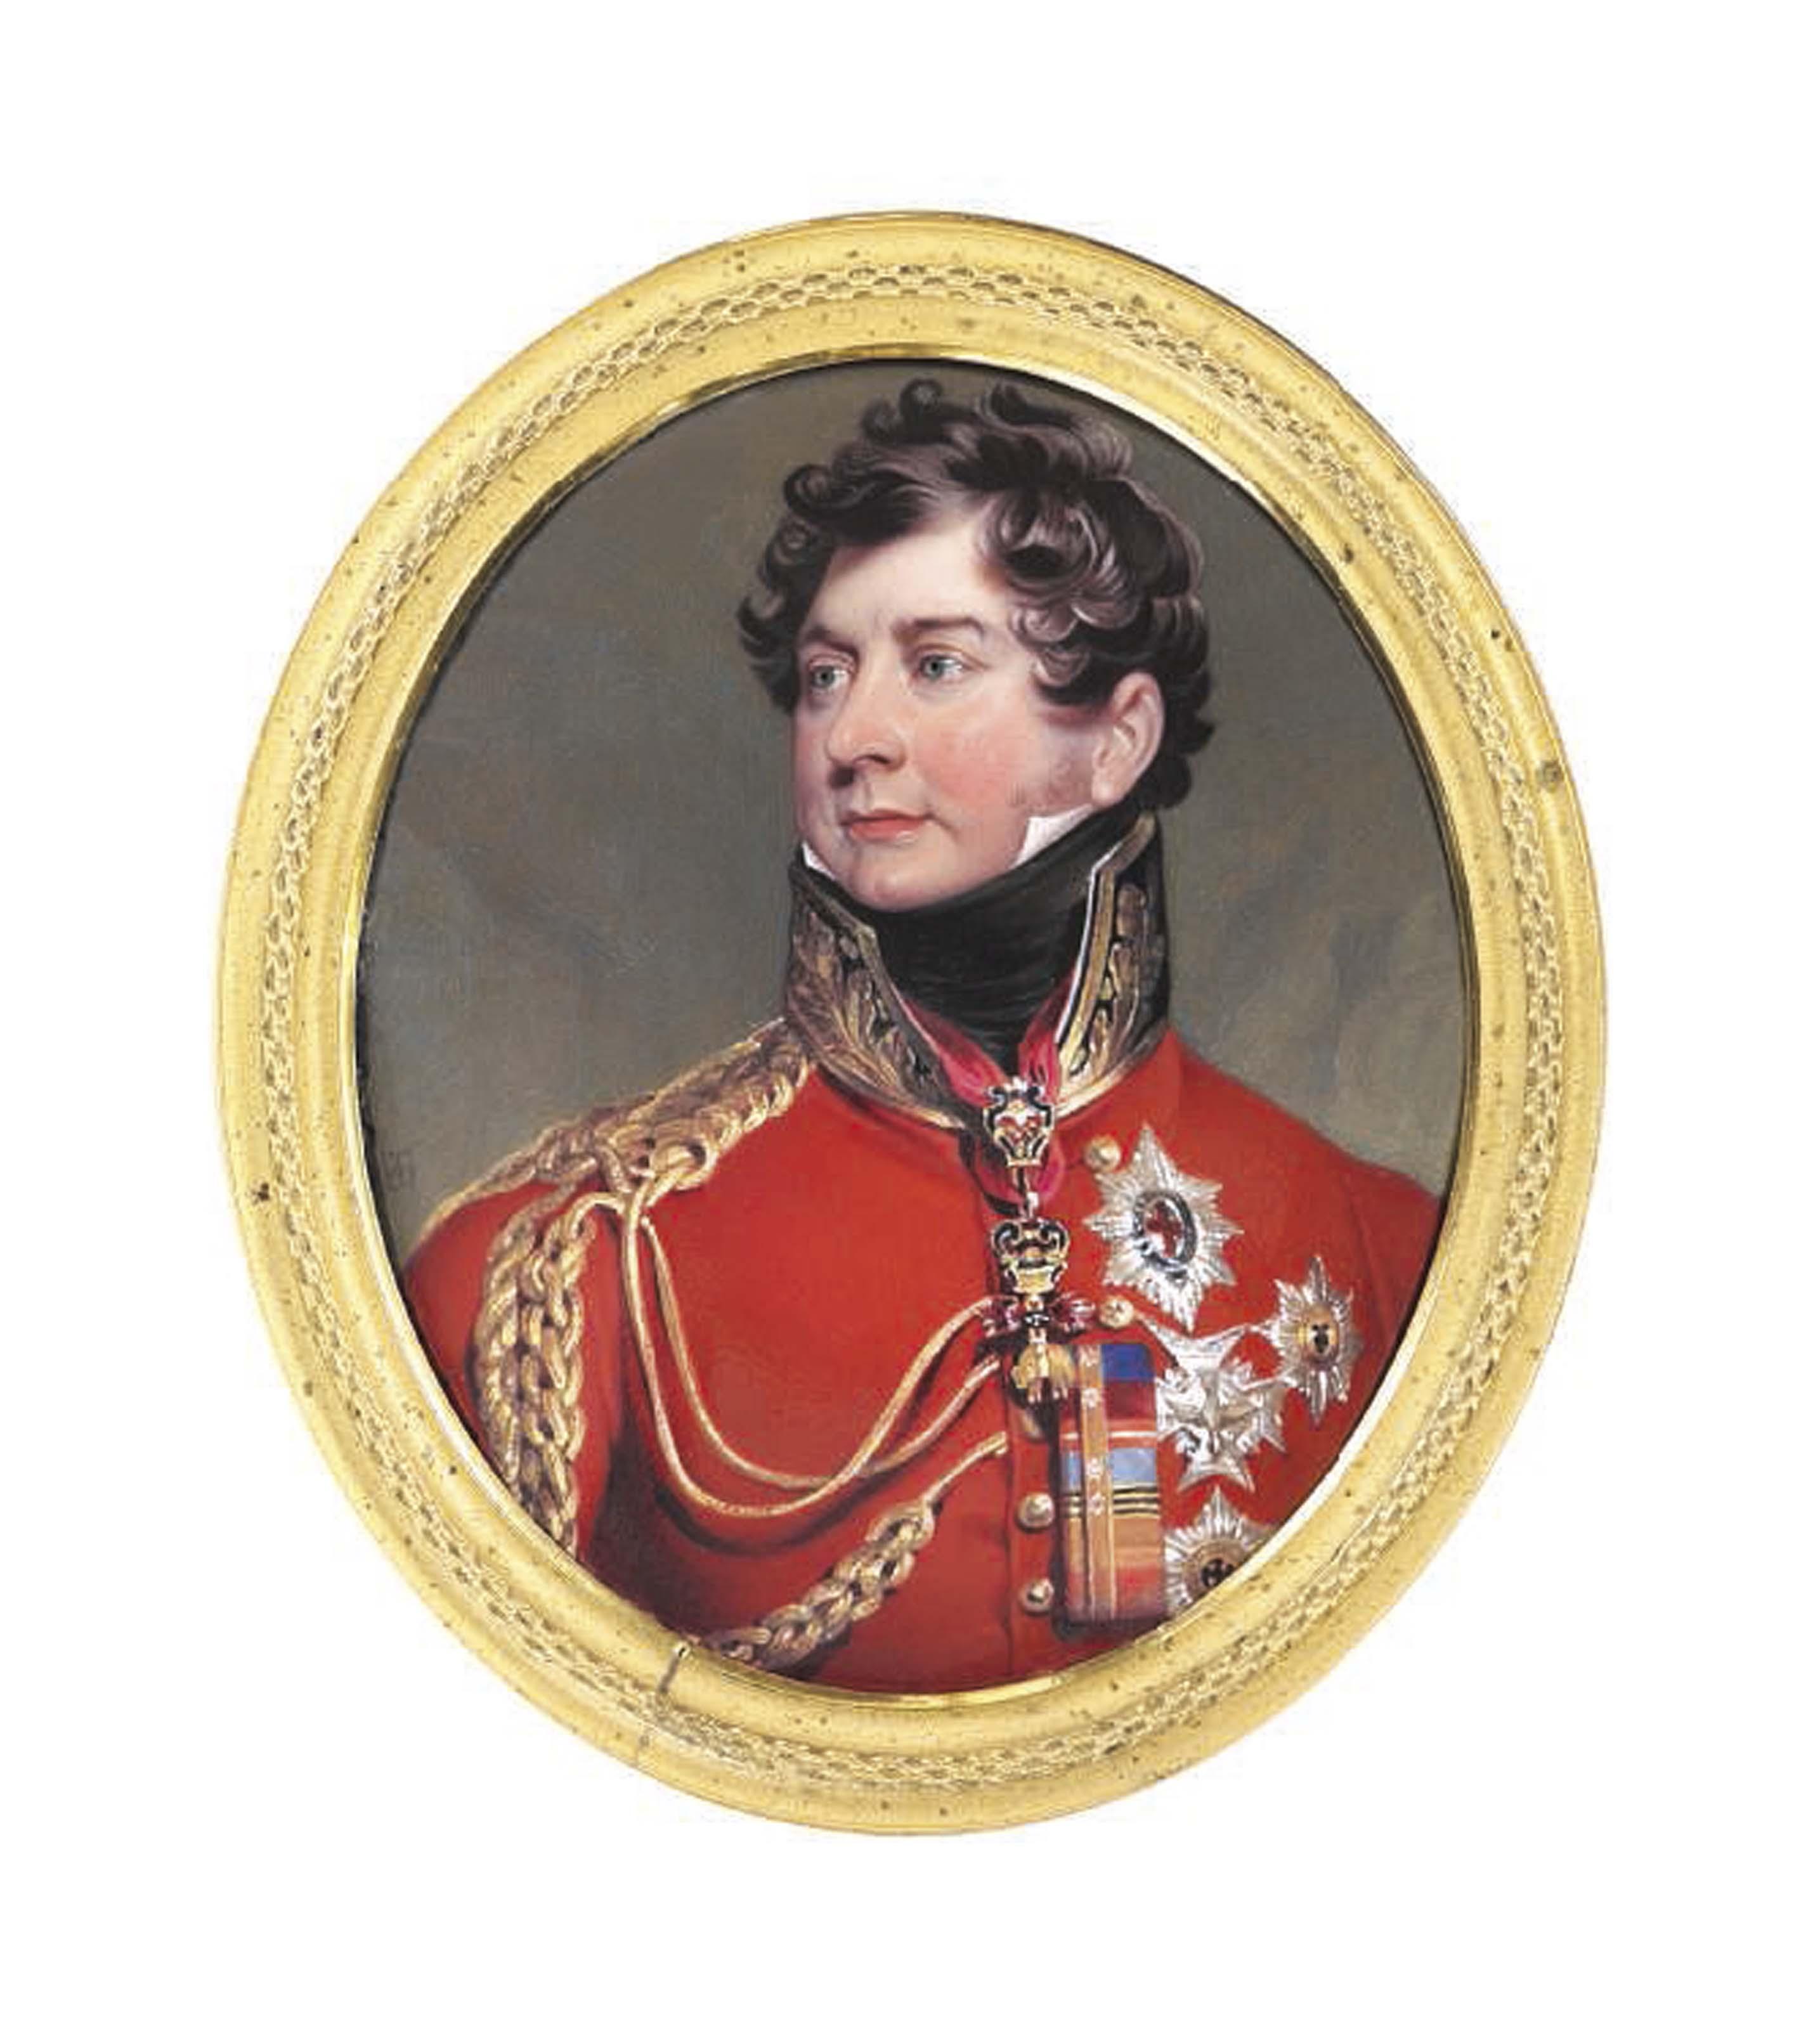 HENRY BONE, R.A. (BRITISH, 1755-1834), AFTER SIR THOMAS LAWRENCE, P.R.A. (BRITISH, 1769-1830)